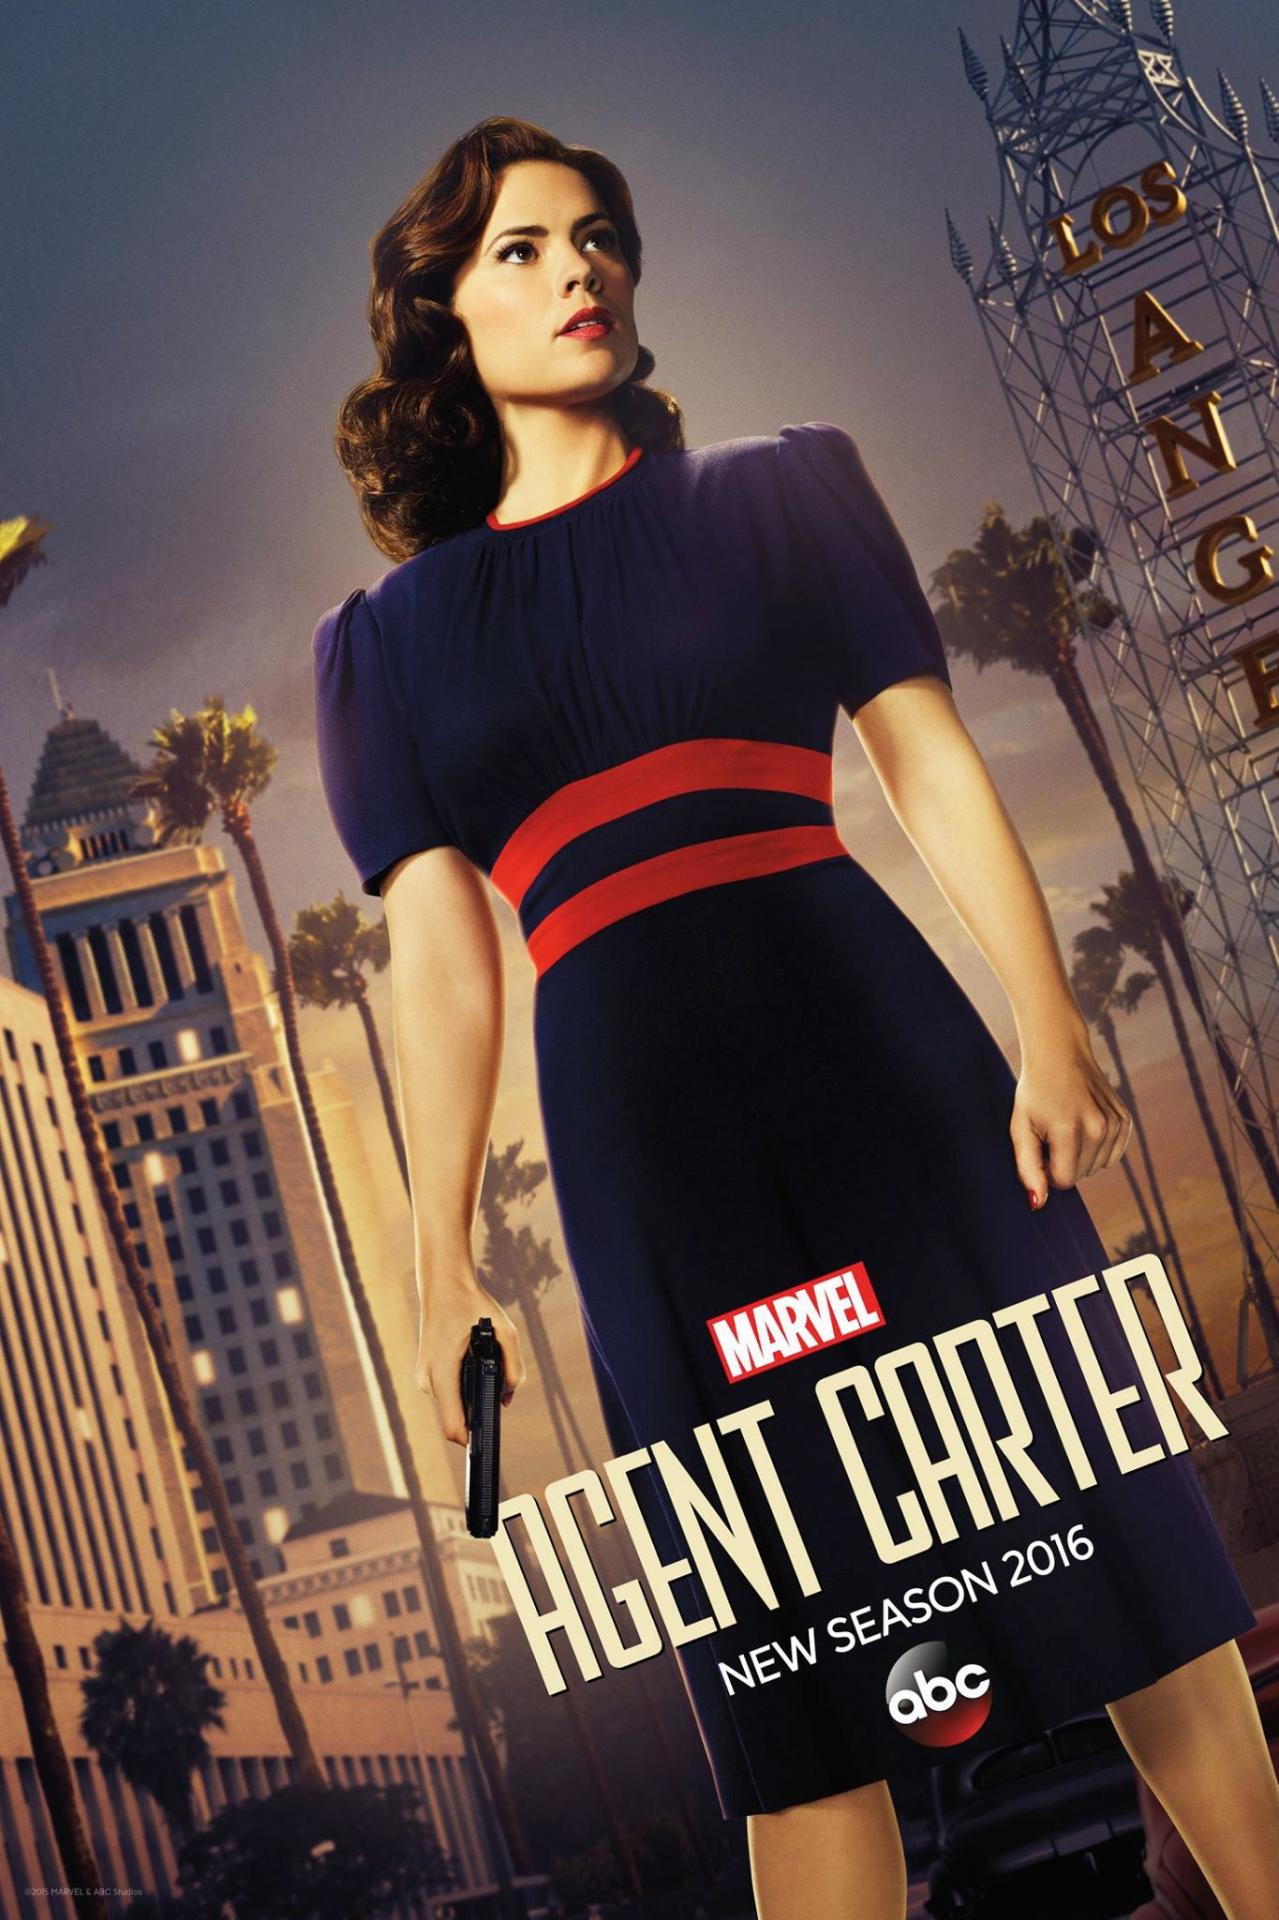 Agentcarter s2 poster